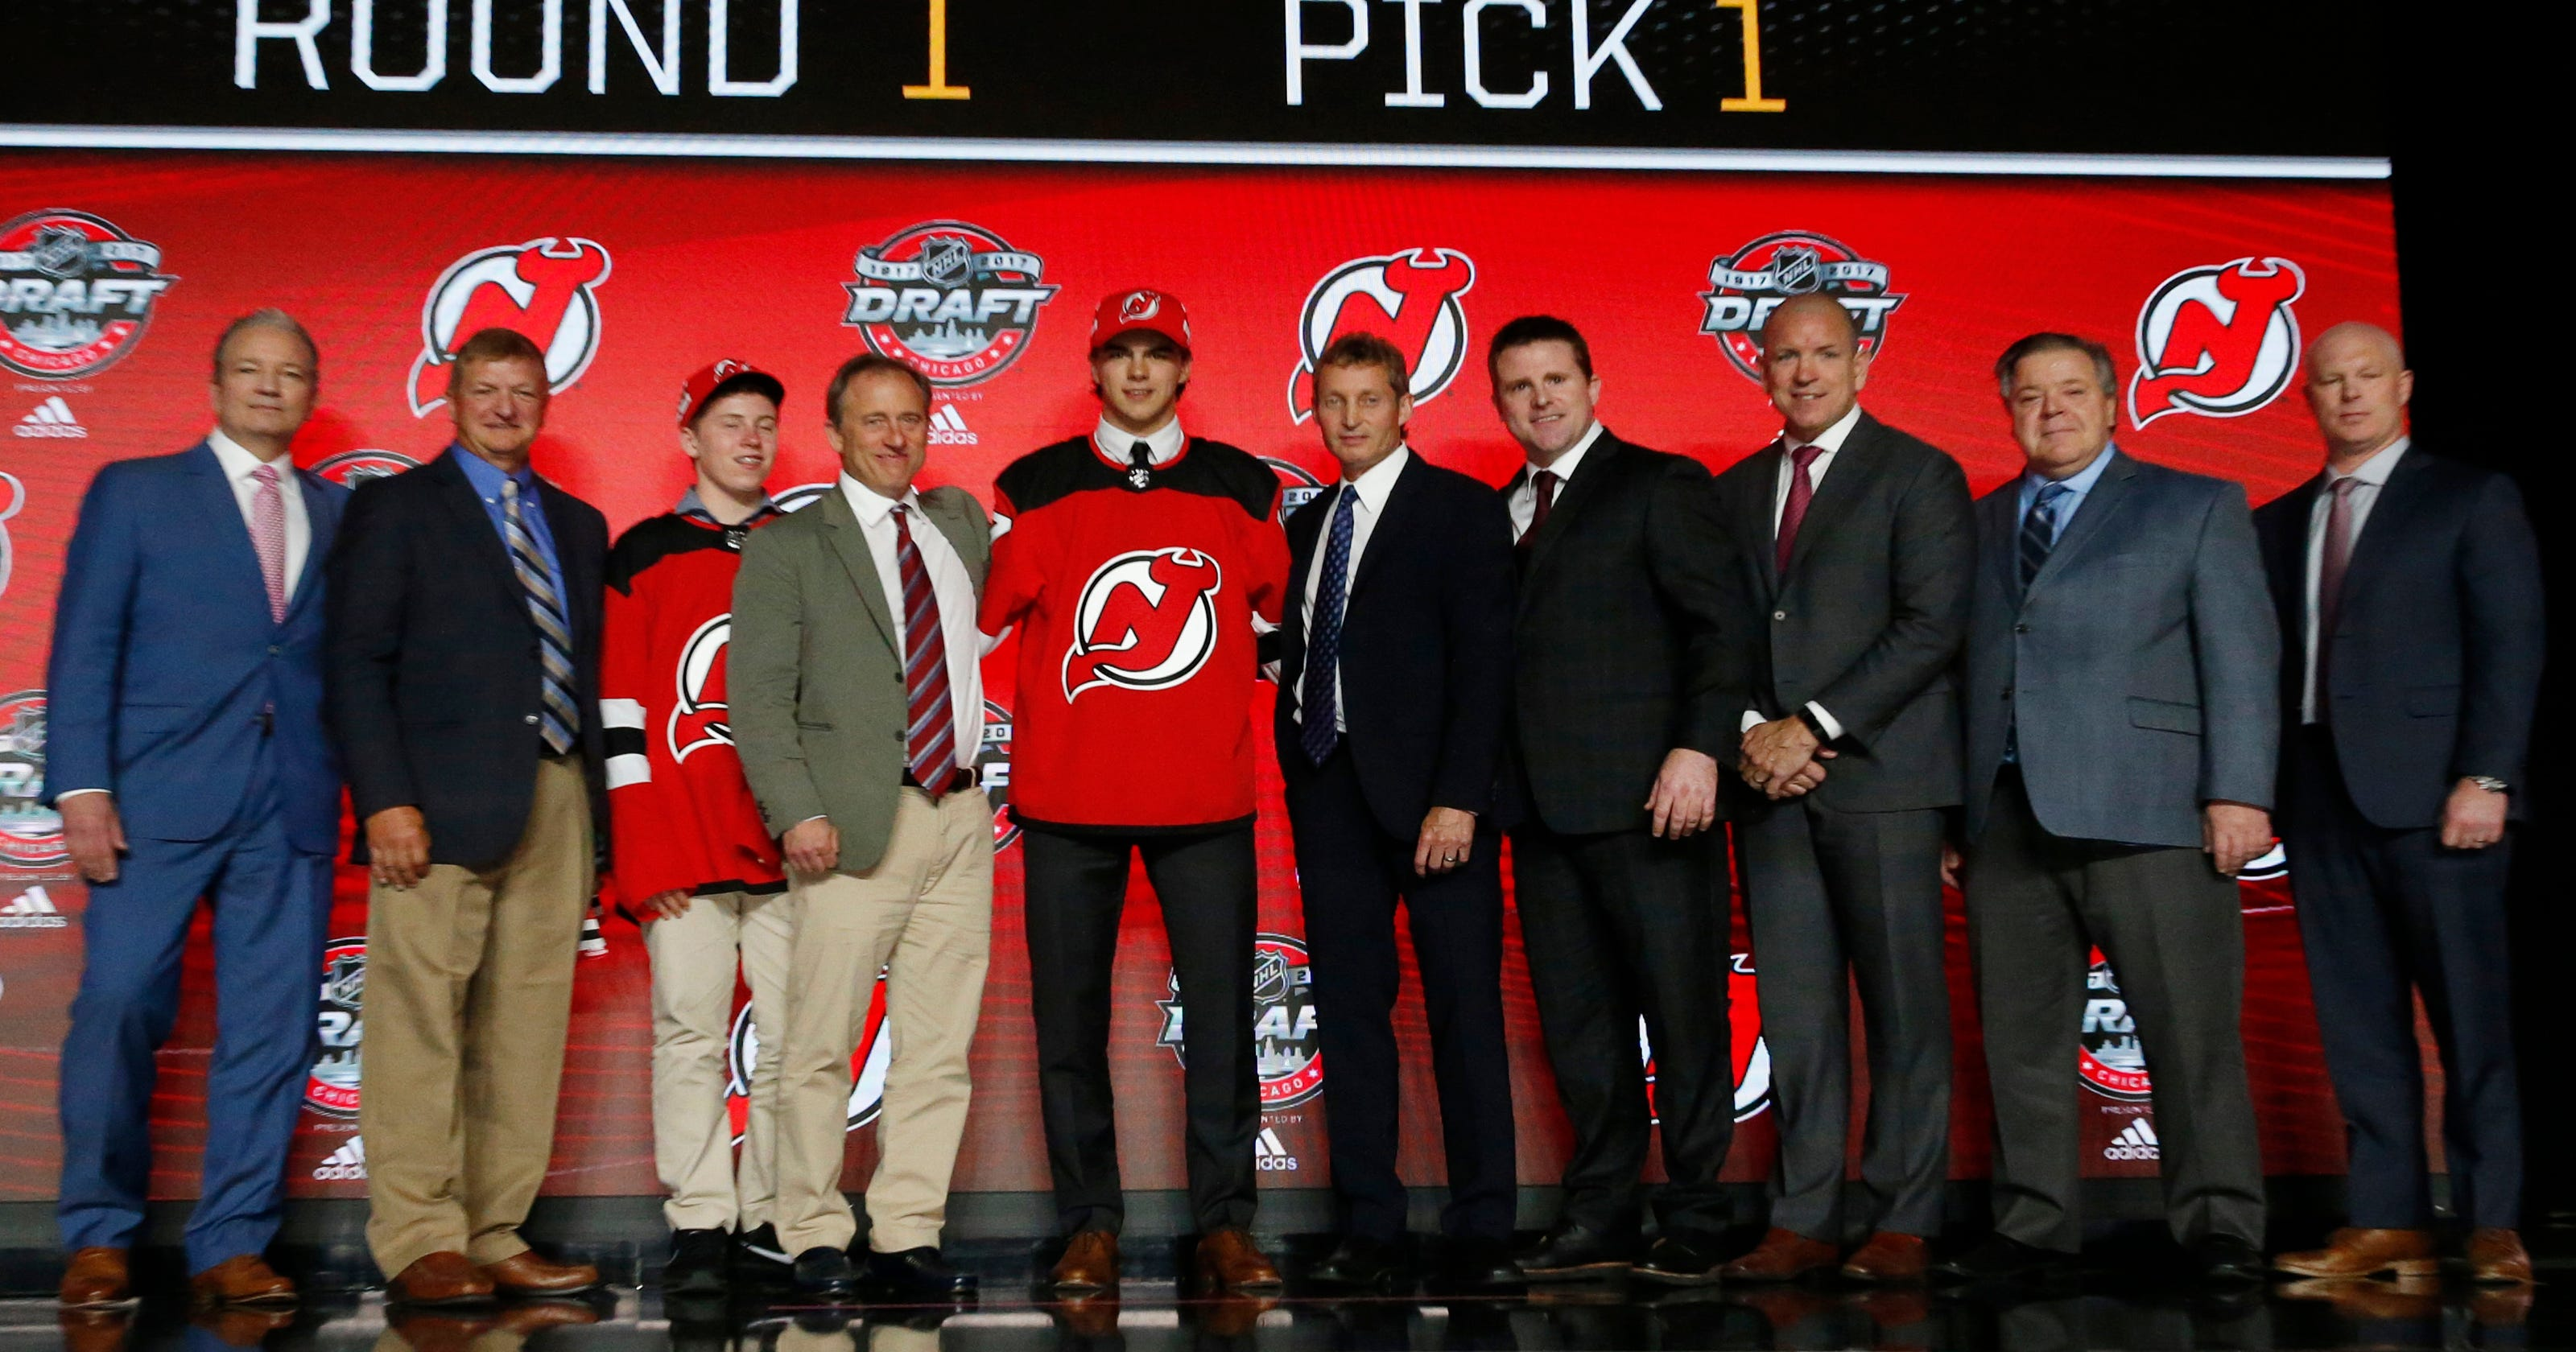 New Jersey Devils  Nico Hischier vs. Flyers  Nolan Patrick 472d8d07d